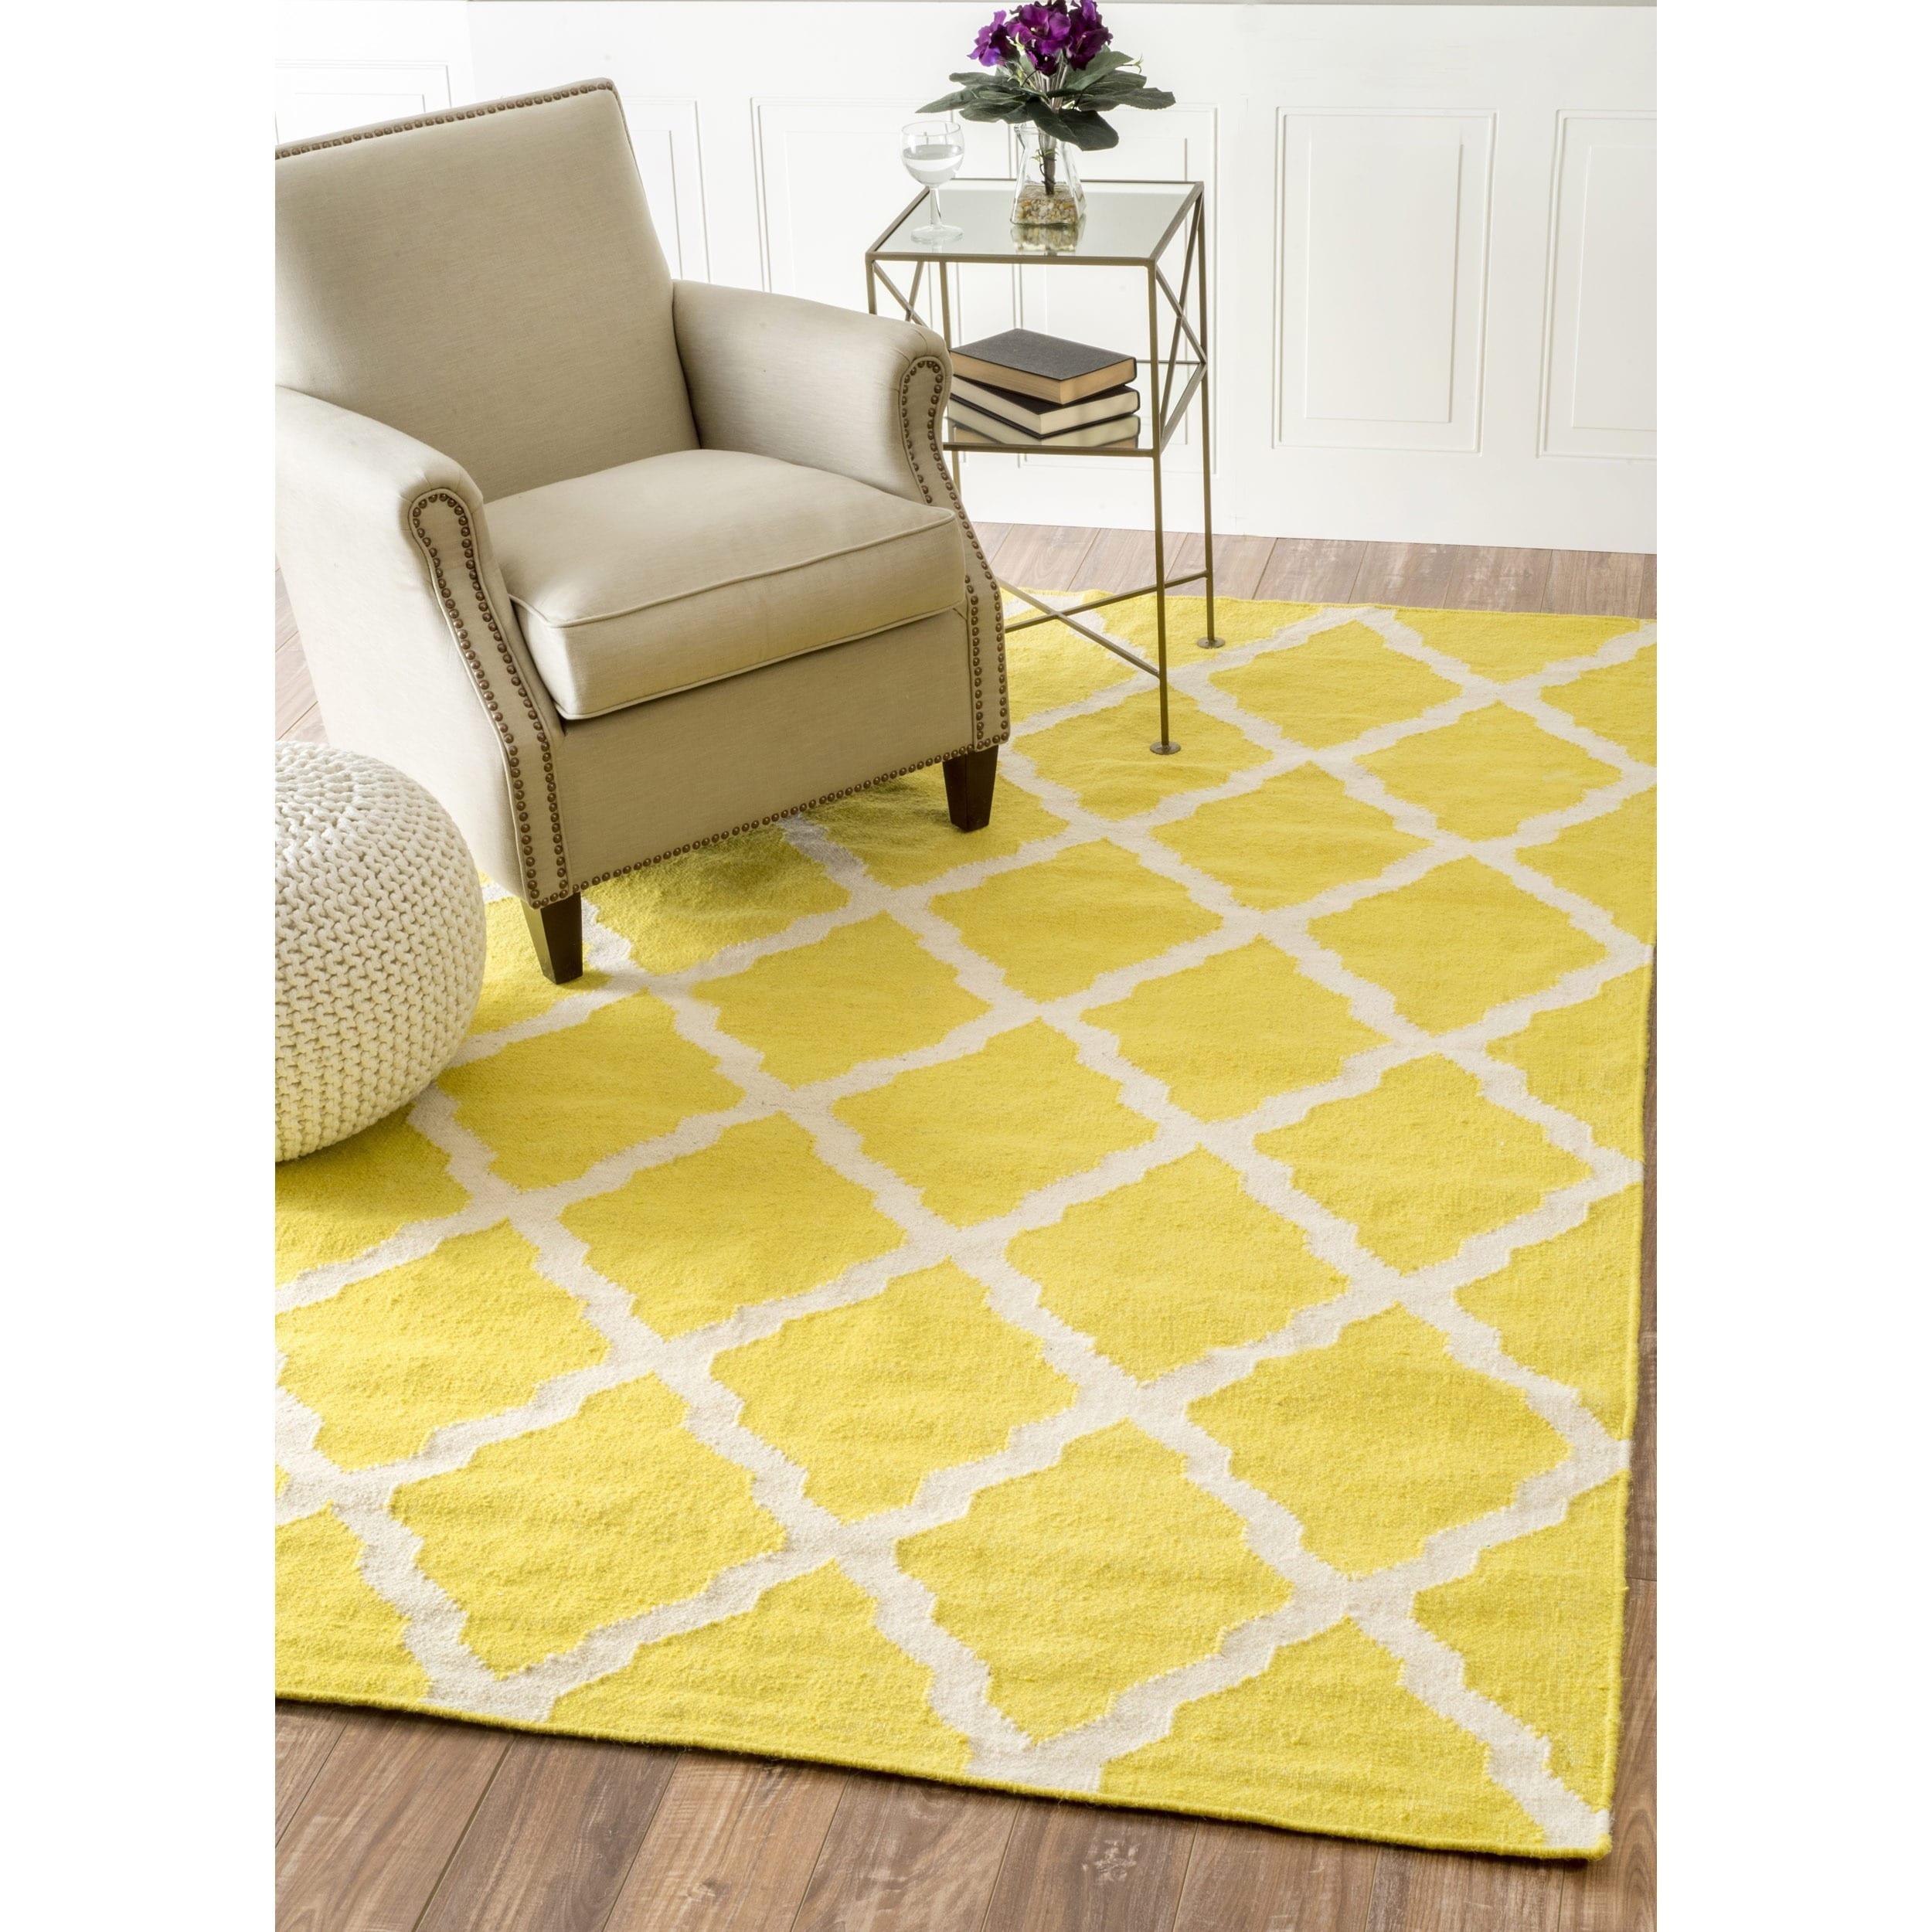 NuLOOM Moroccan Trellis Flatweave Kilim Yellow Wool Rug (7